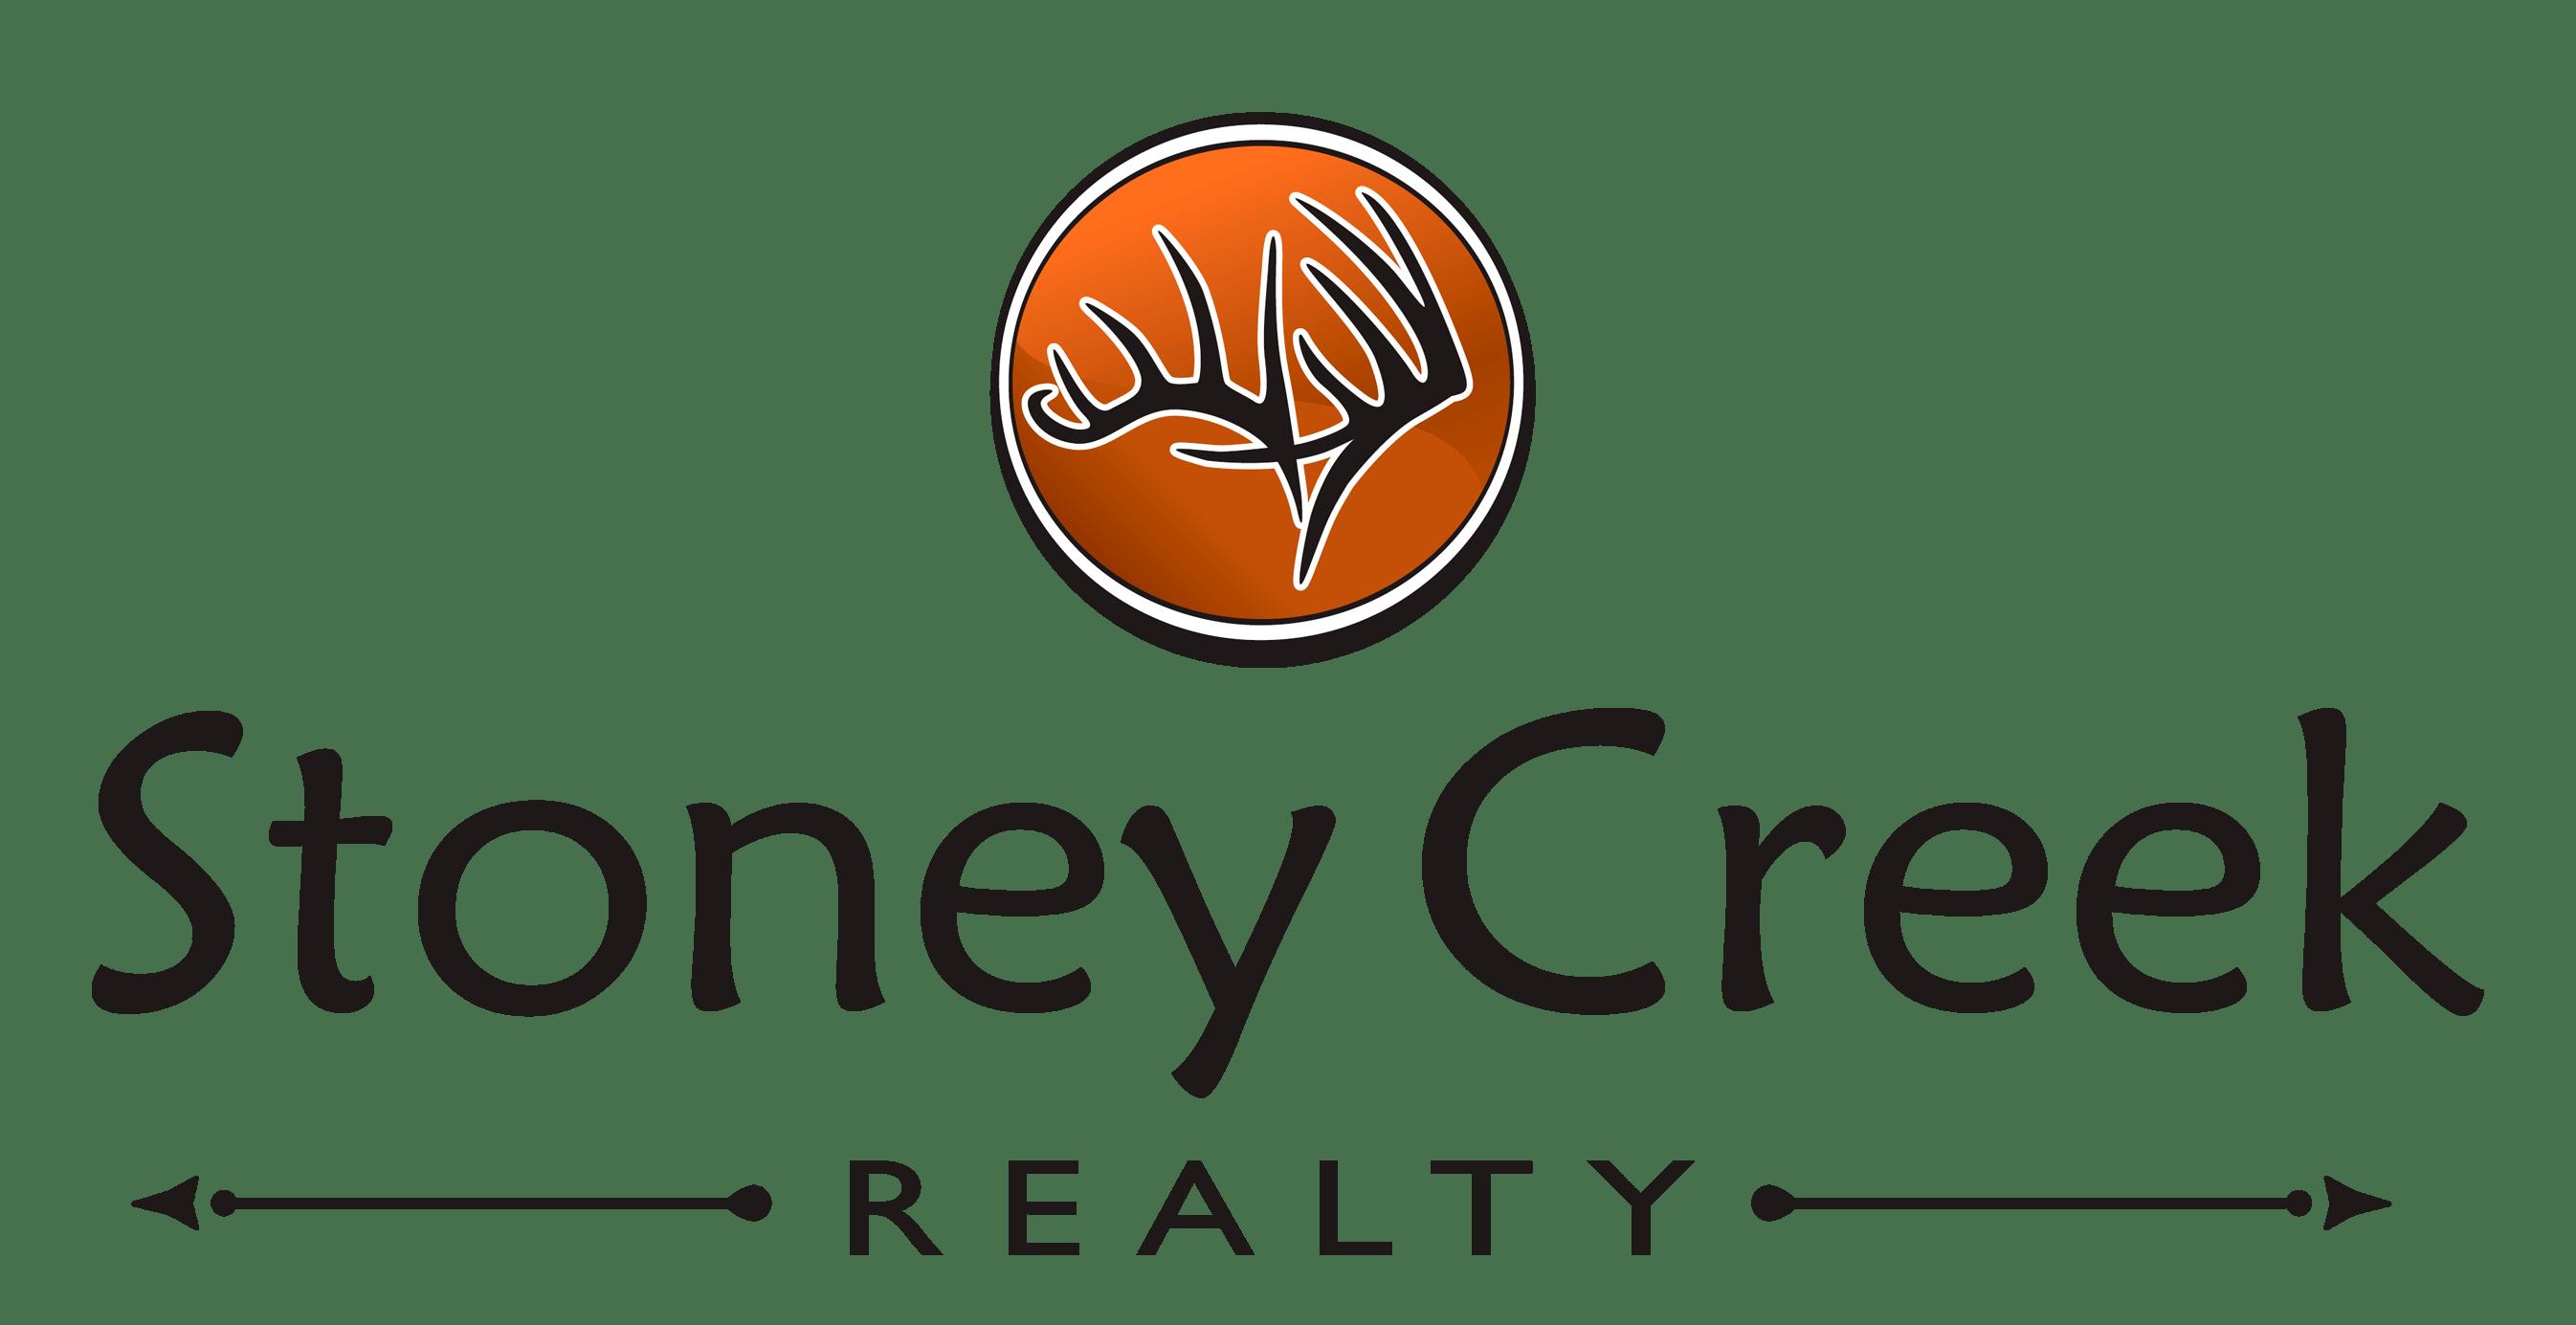 Stoney Creek Realty